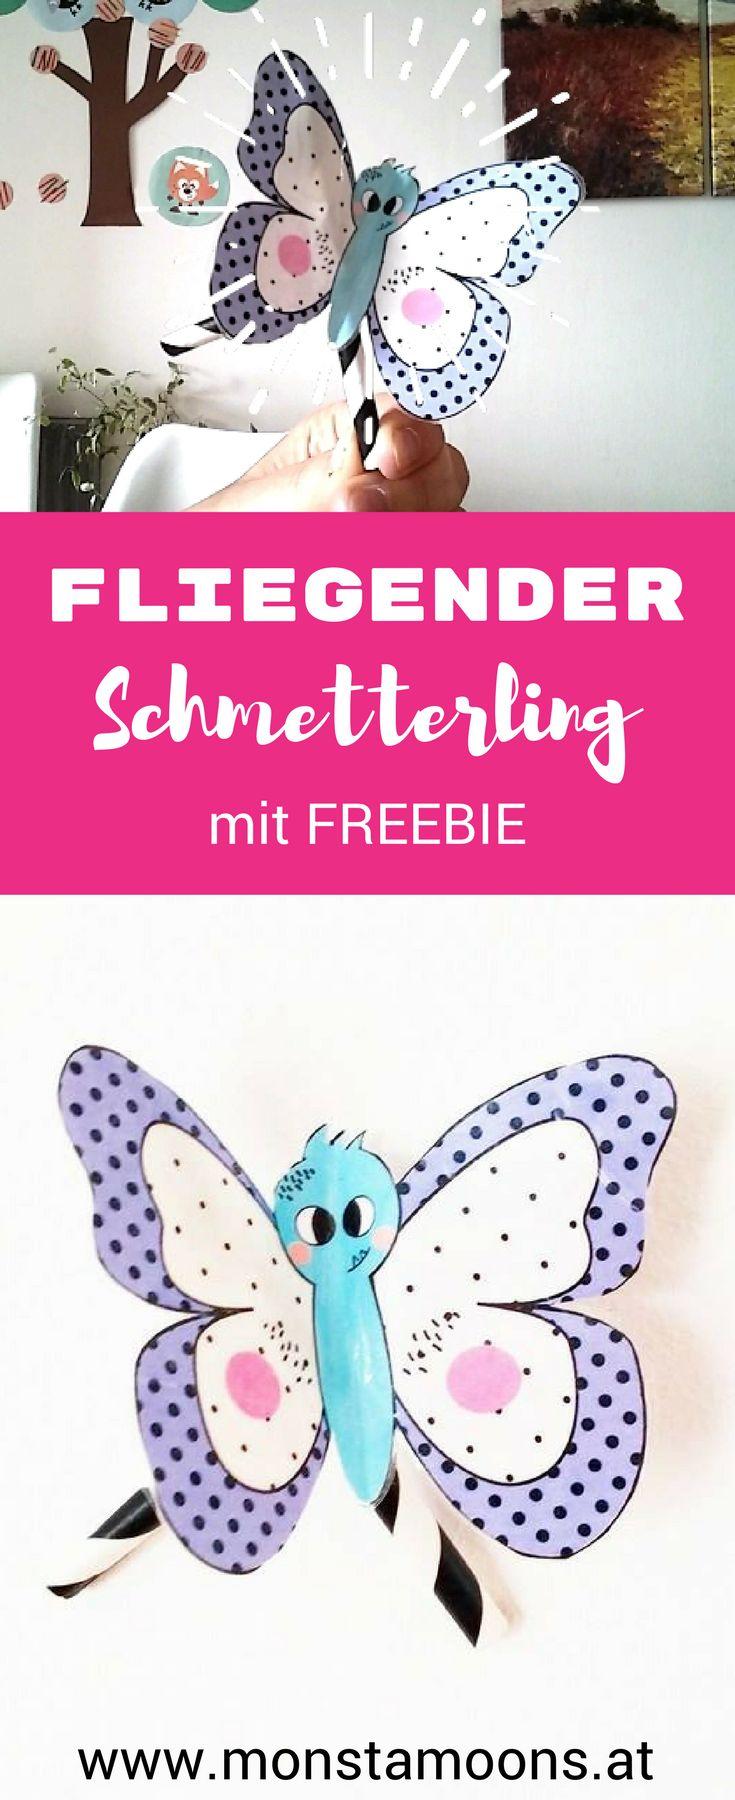 Monstamoons, Schmetterlinge basteln, DIY butterfly, fliegender SChmetterling, Basteln für den Frühling, spring crafts, butterfly crafts, summer crafts, Sommer Basteln